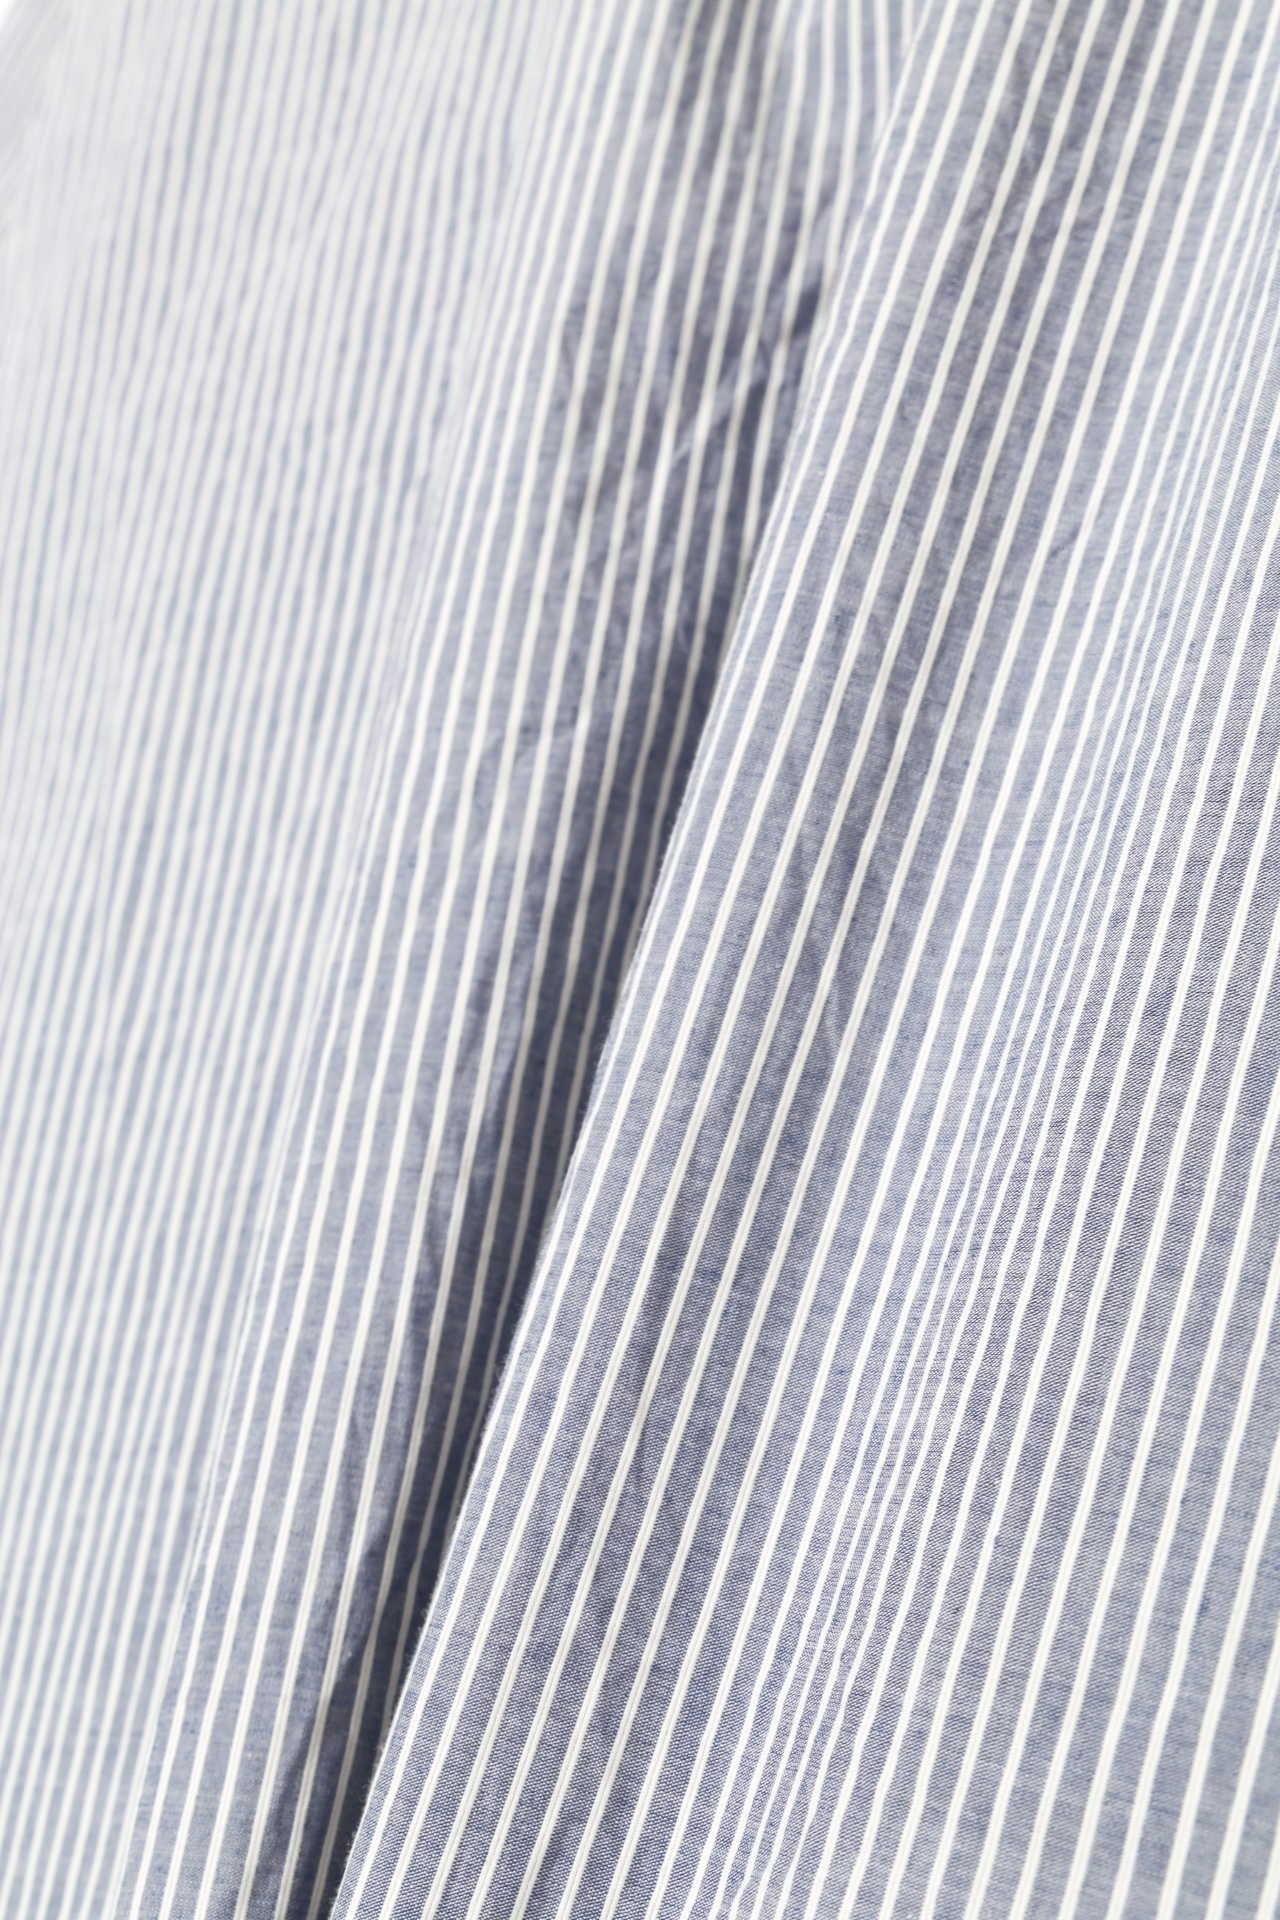 COTTON LINEN STRIPE6